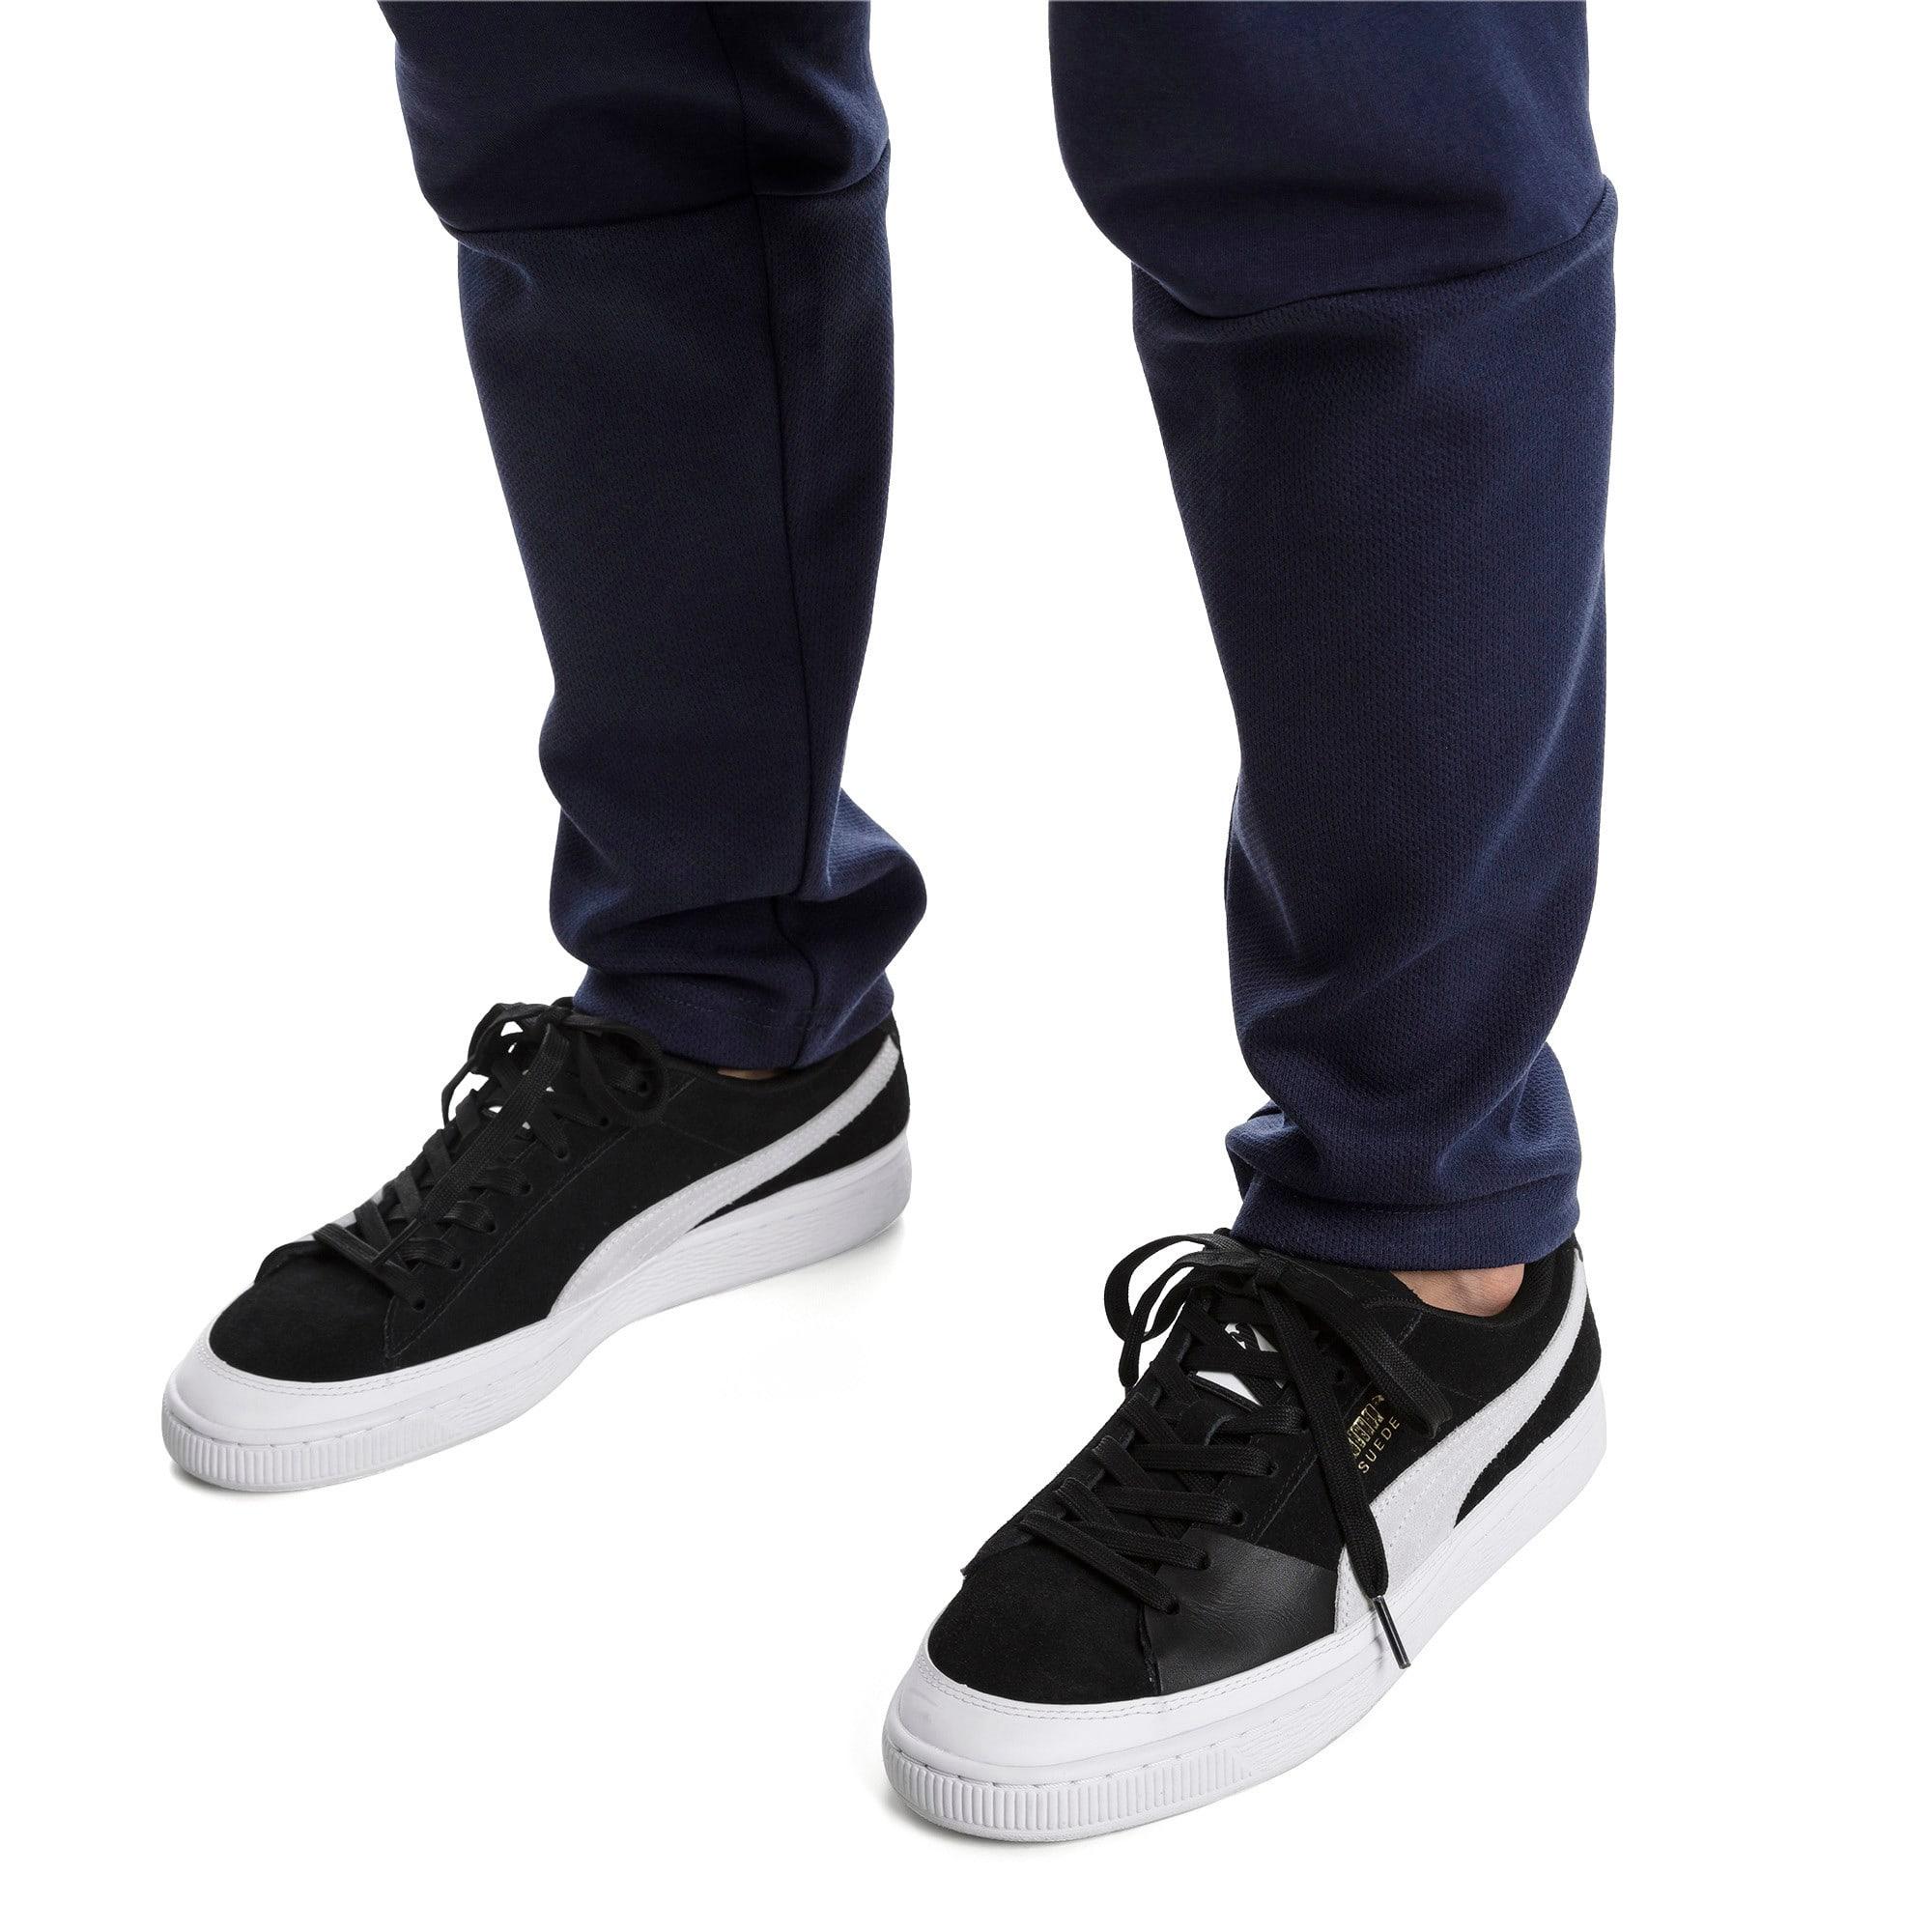 Thumbnail 7 of Suede Skate Sneakers, Puma Black-Puma White, medium